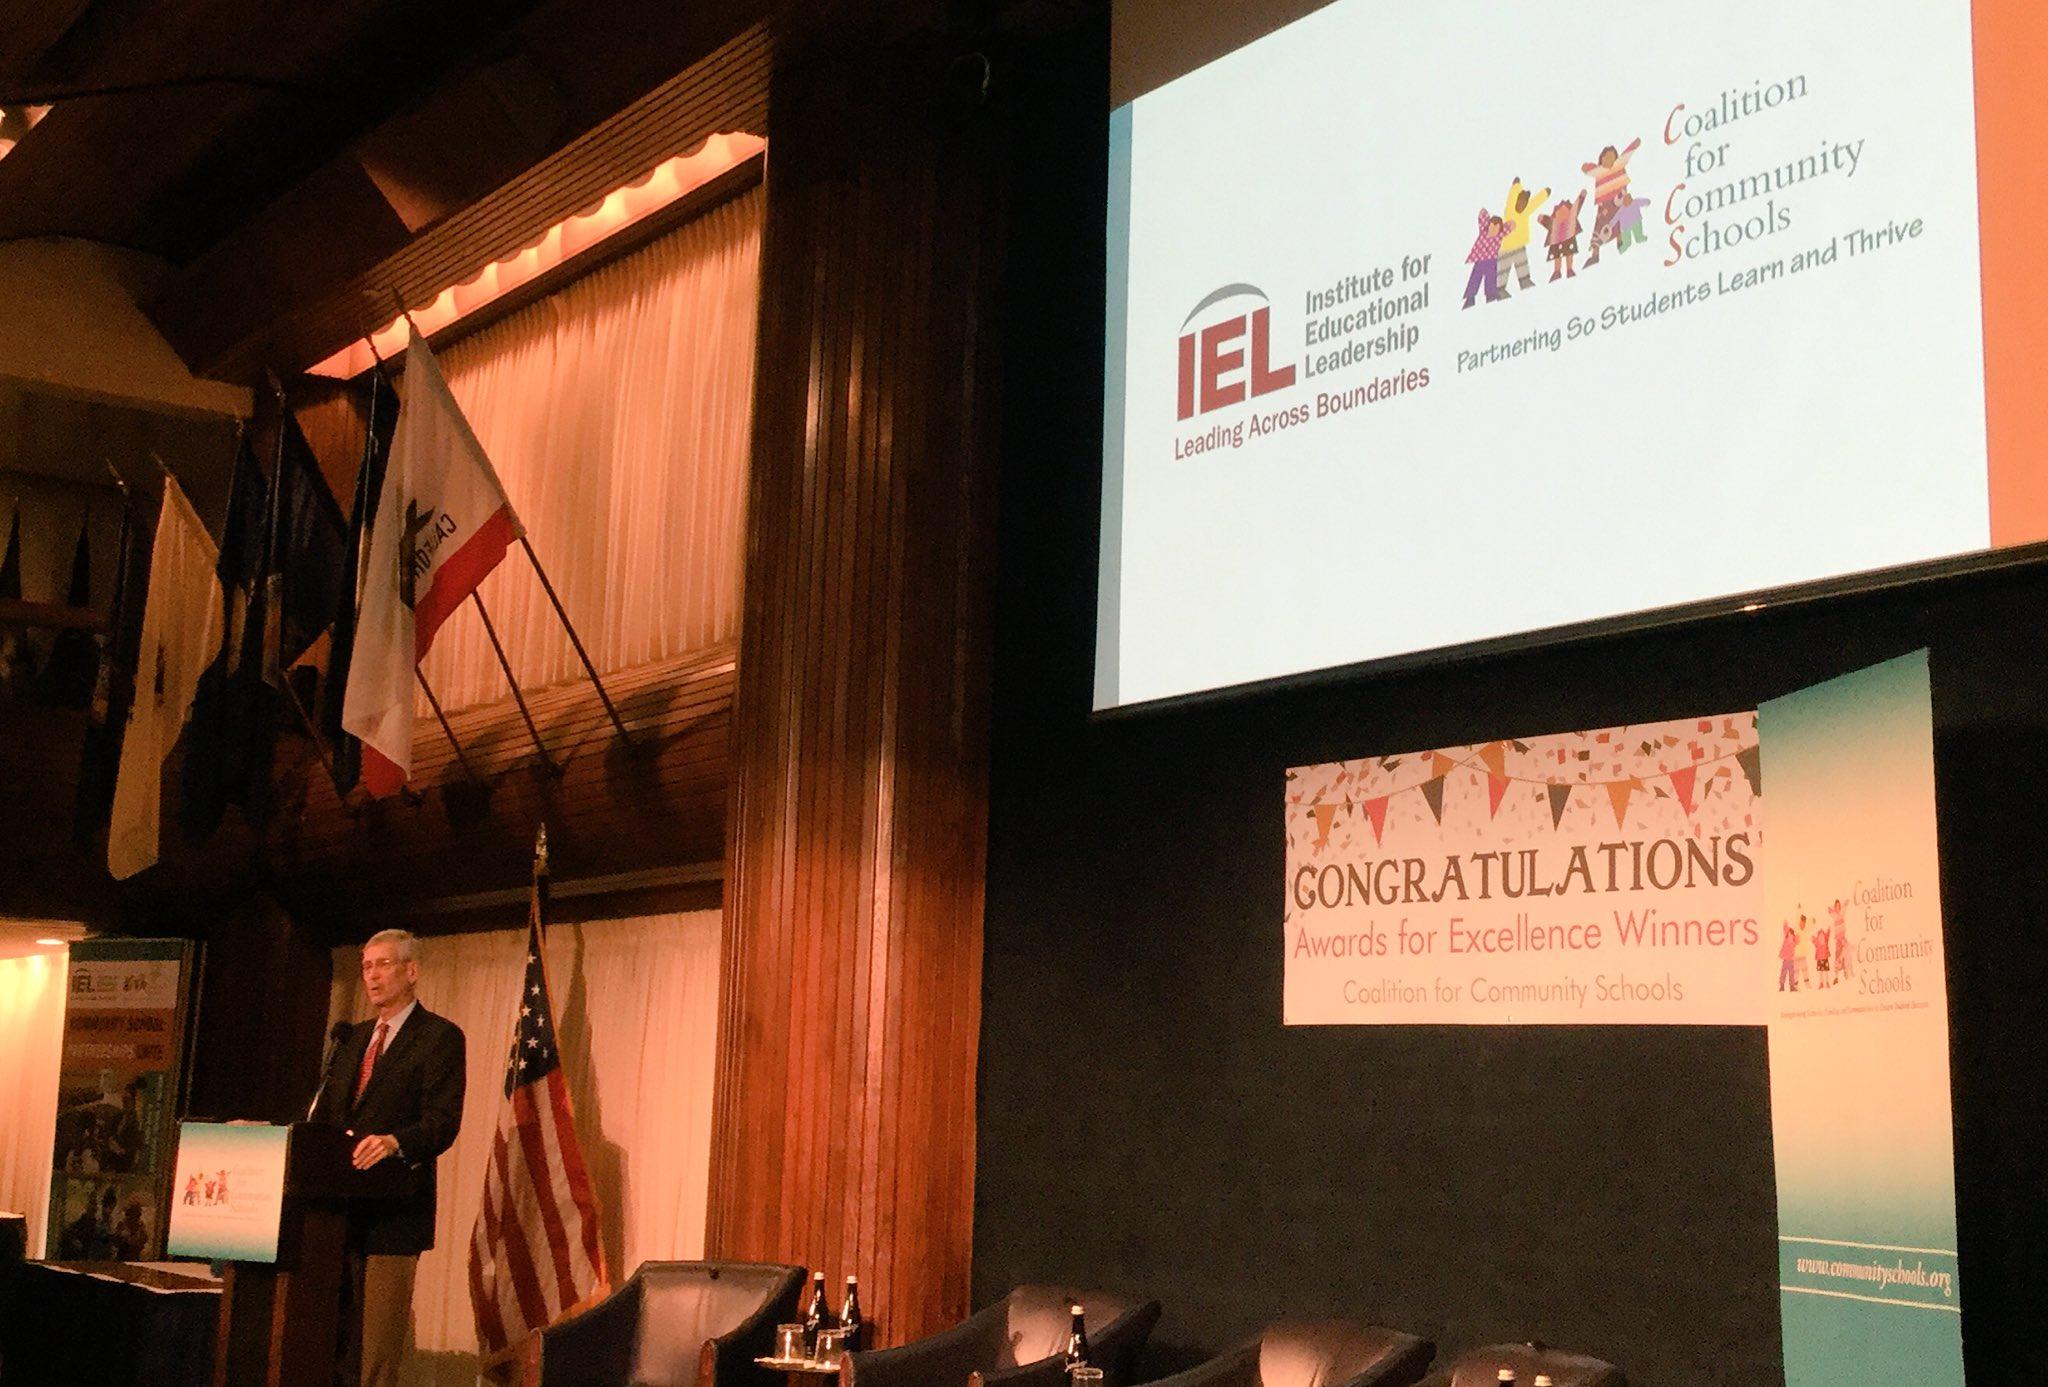 .@MartyBlankIEL opens the @CommSchools #communityschools symposium and awards ceremony. https://t.co/ckXsM9UAHe